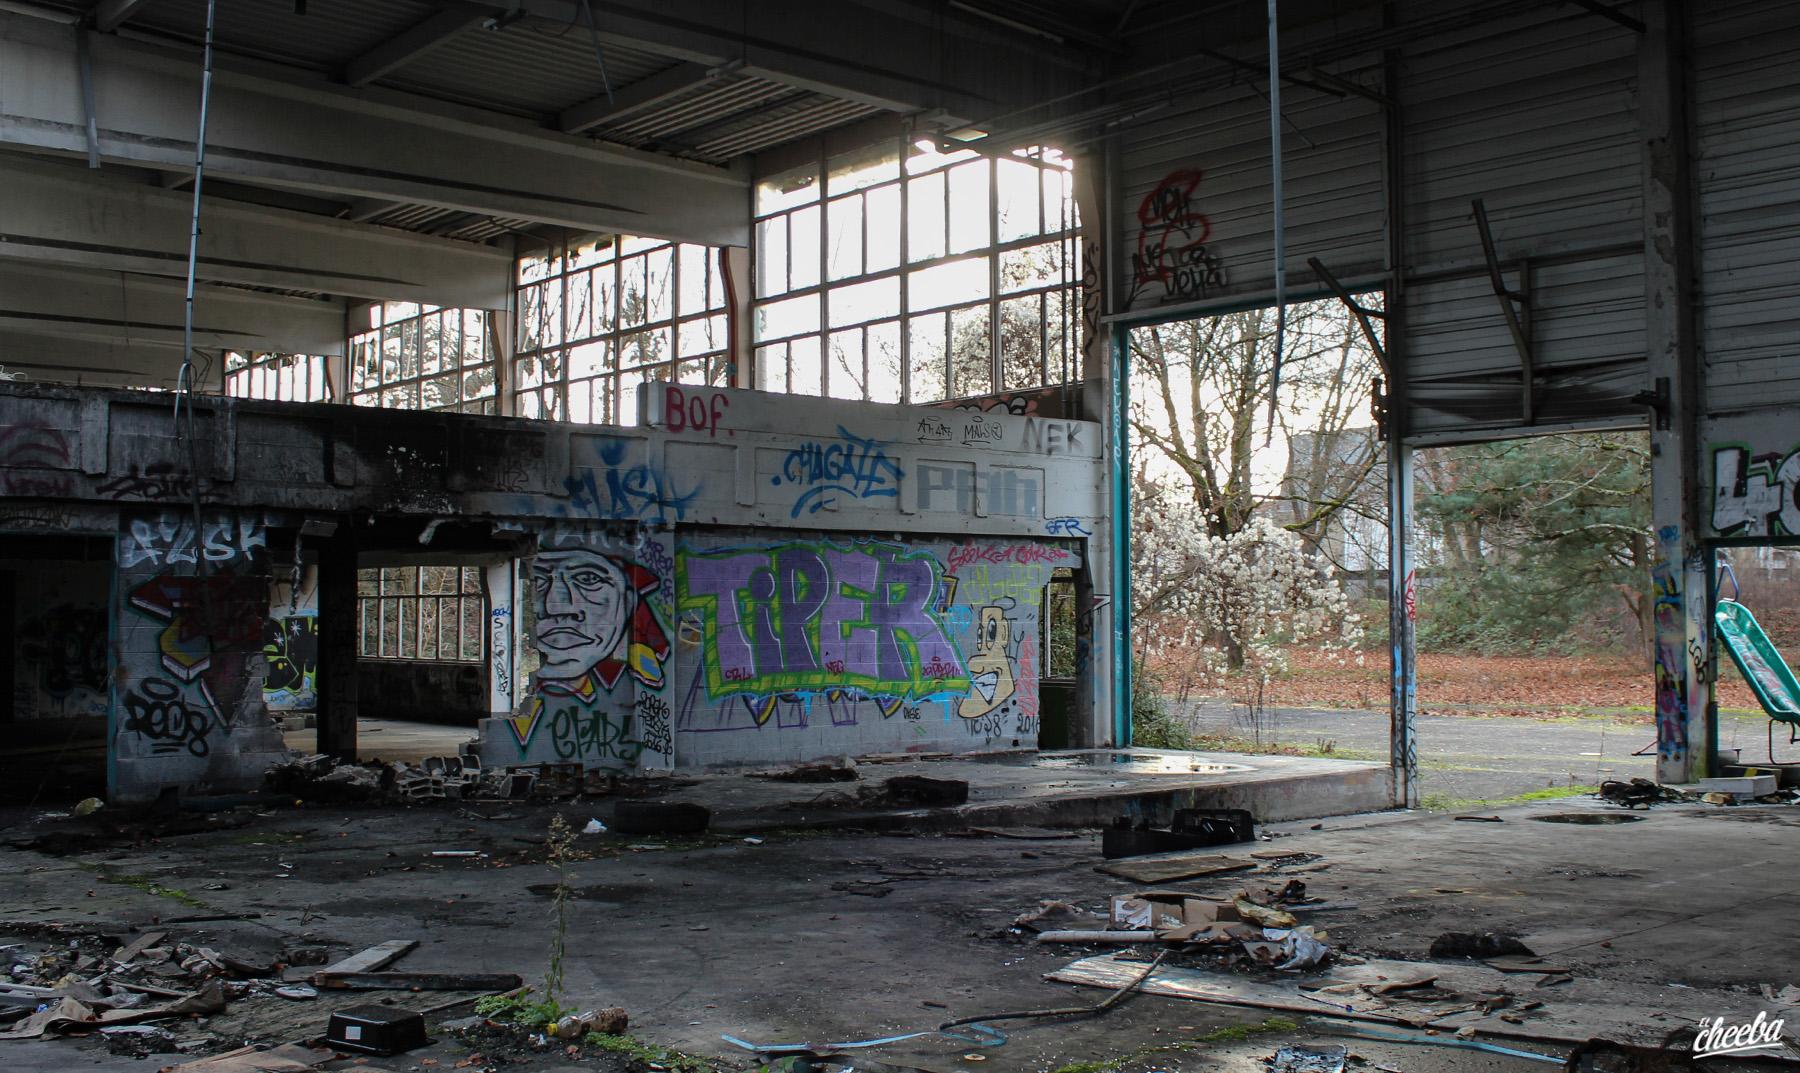 Urbex à l'Imprimerie Istra à Schiltigheim en Alsace - Urbex Alsace by El Cheeba